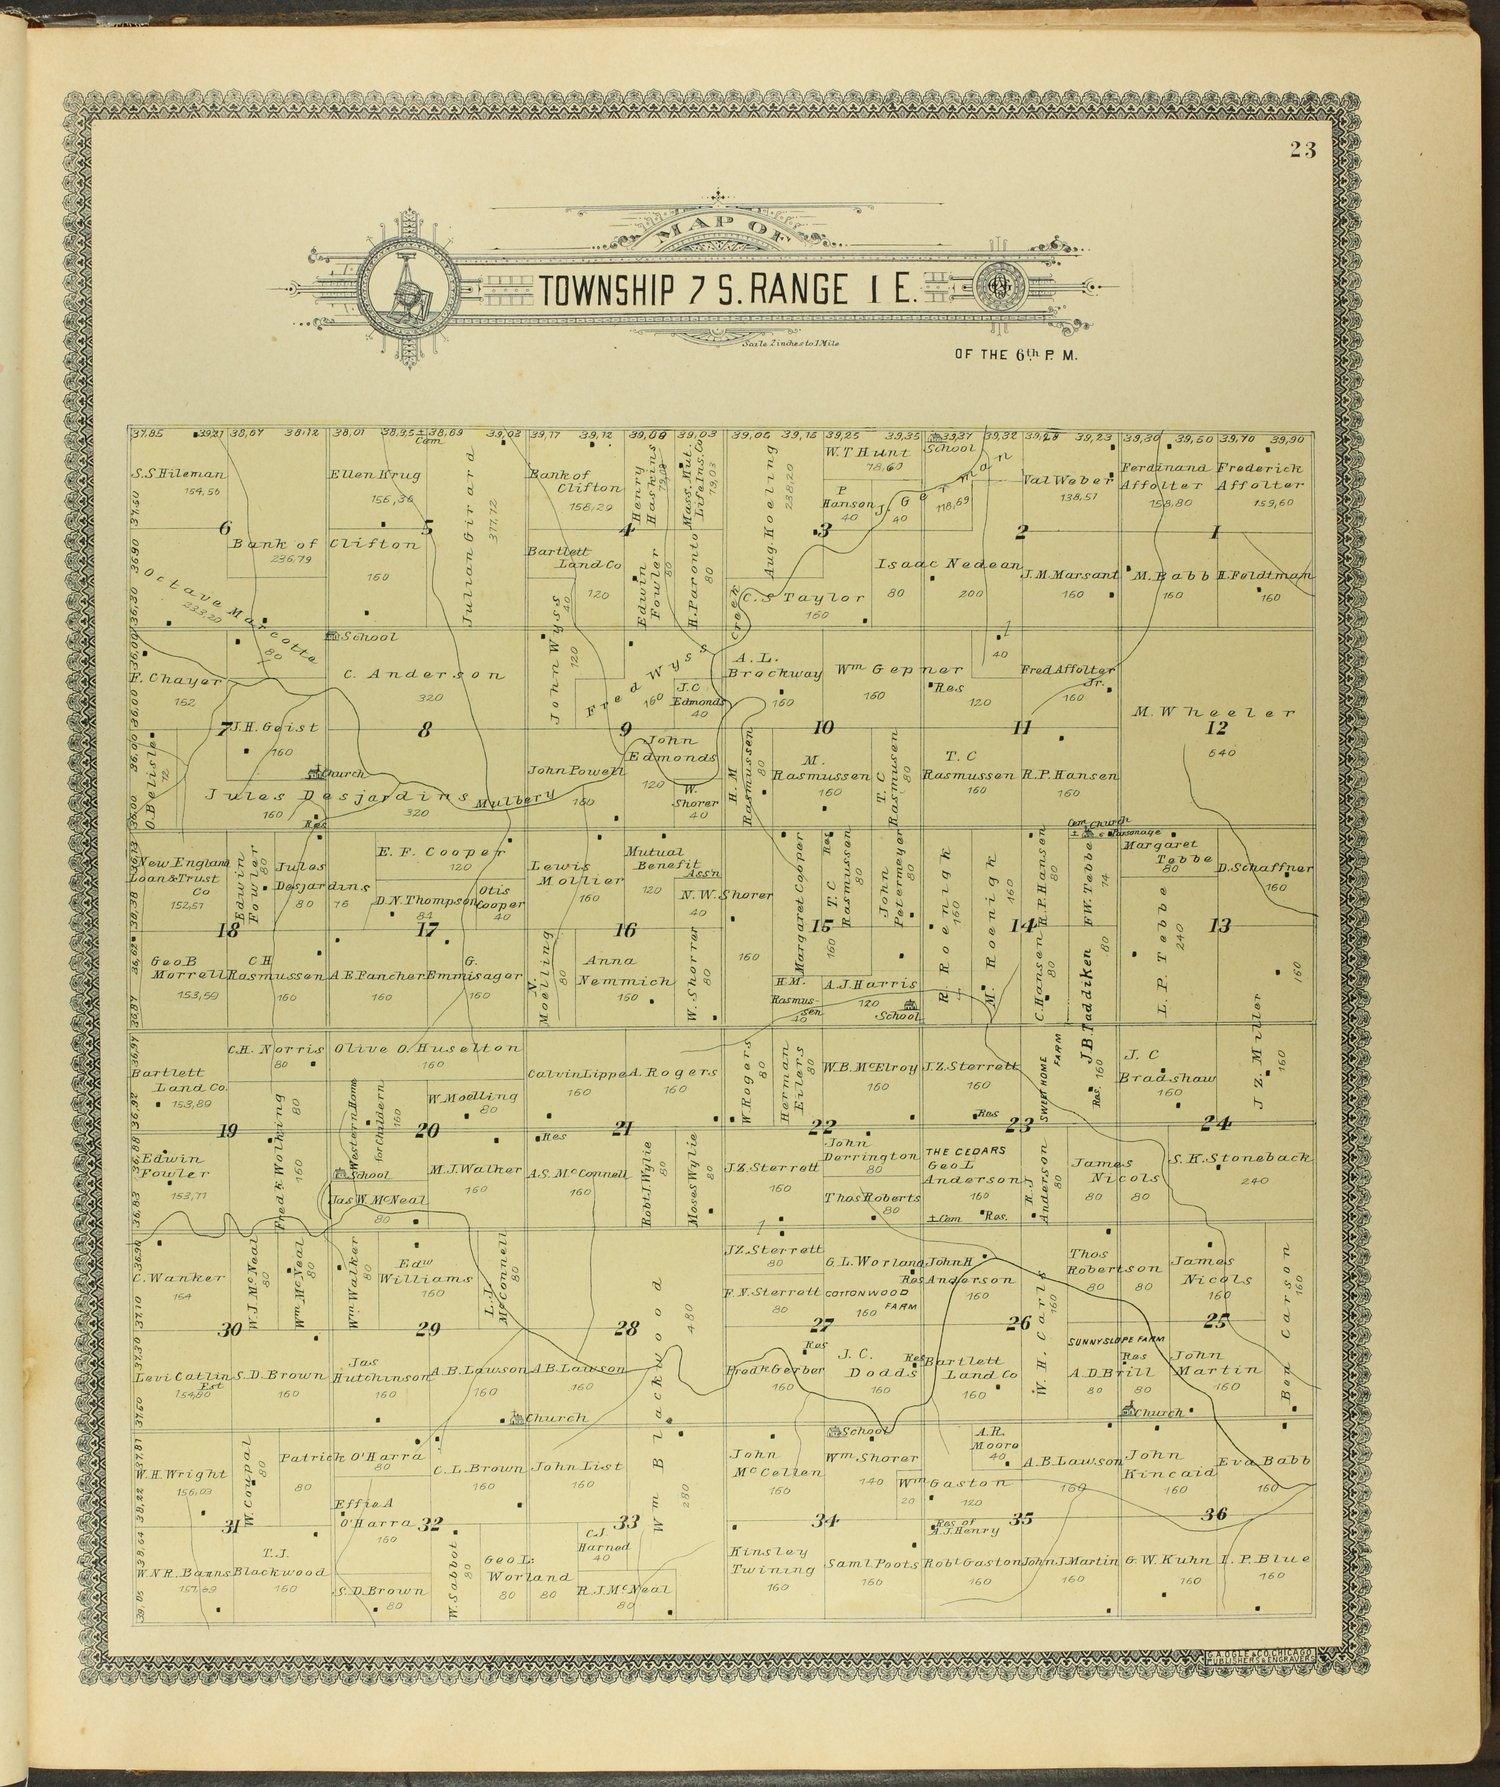 Standard atlas of Clay County, Kansas - 23